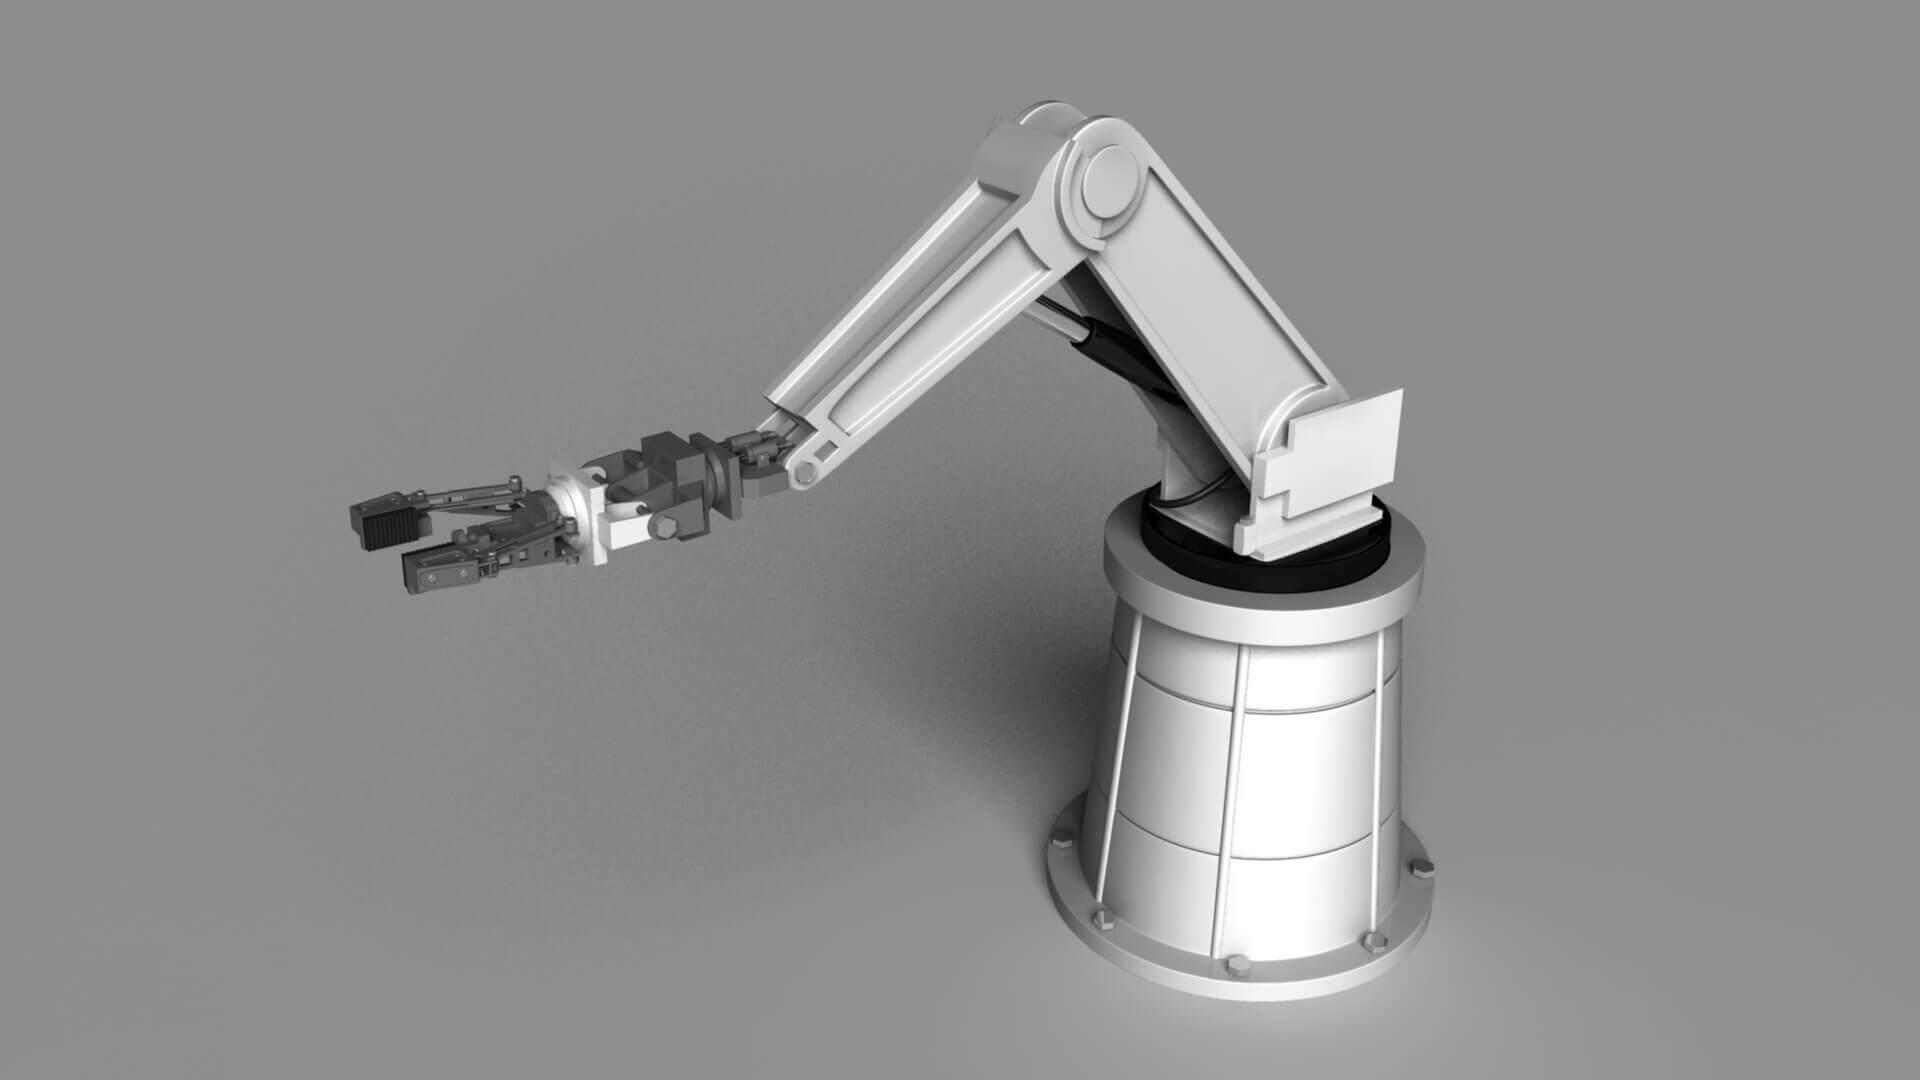 Robot Arm 3d Model Free